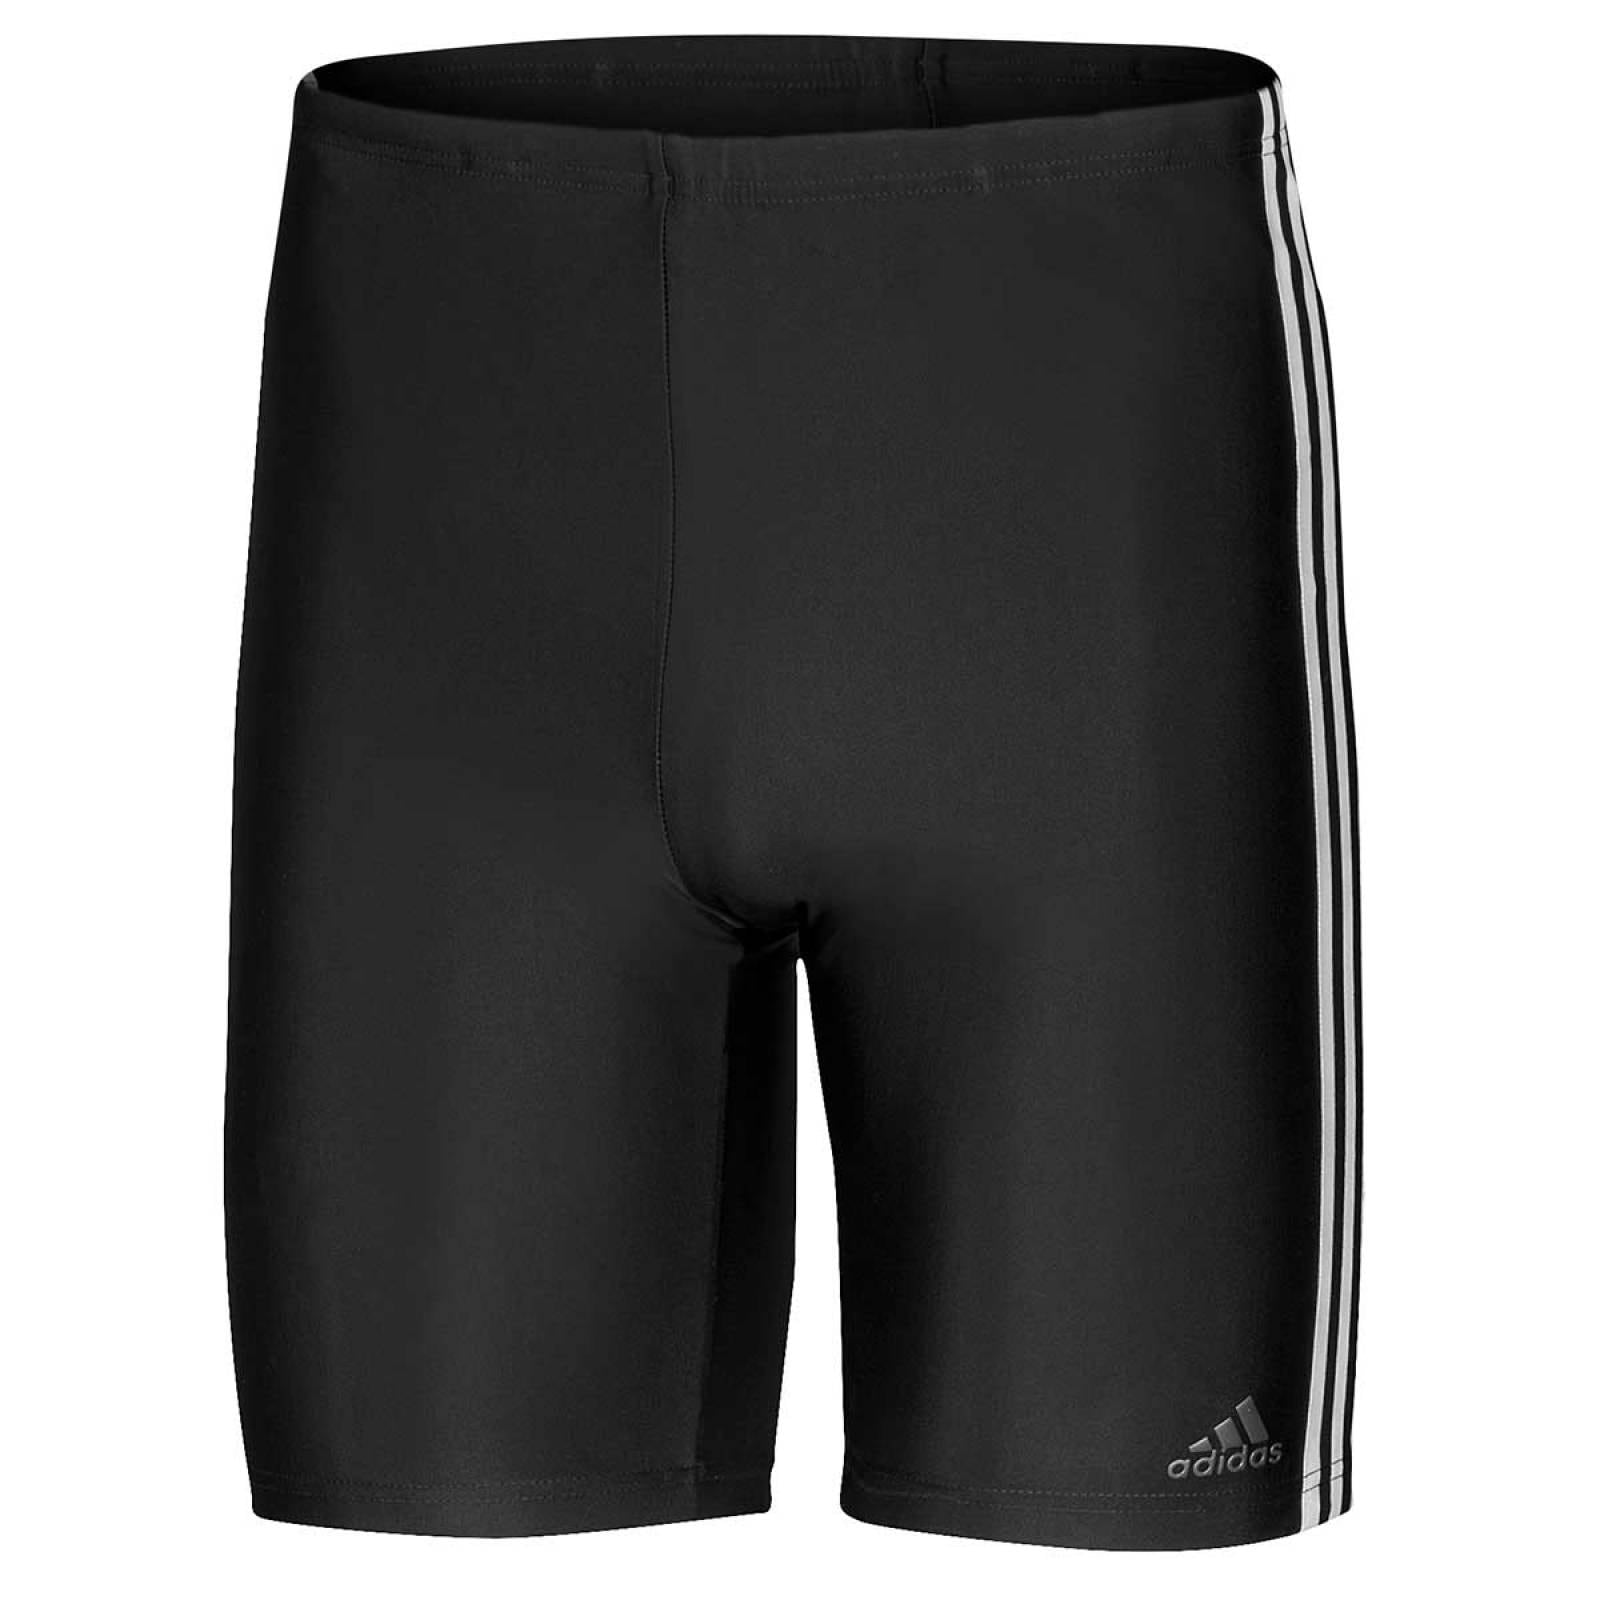 Adidas Traje de bano Hombre Negro blanco fit jam 3s